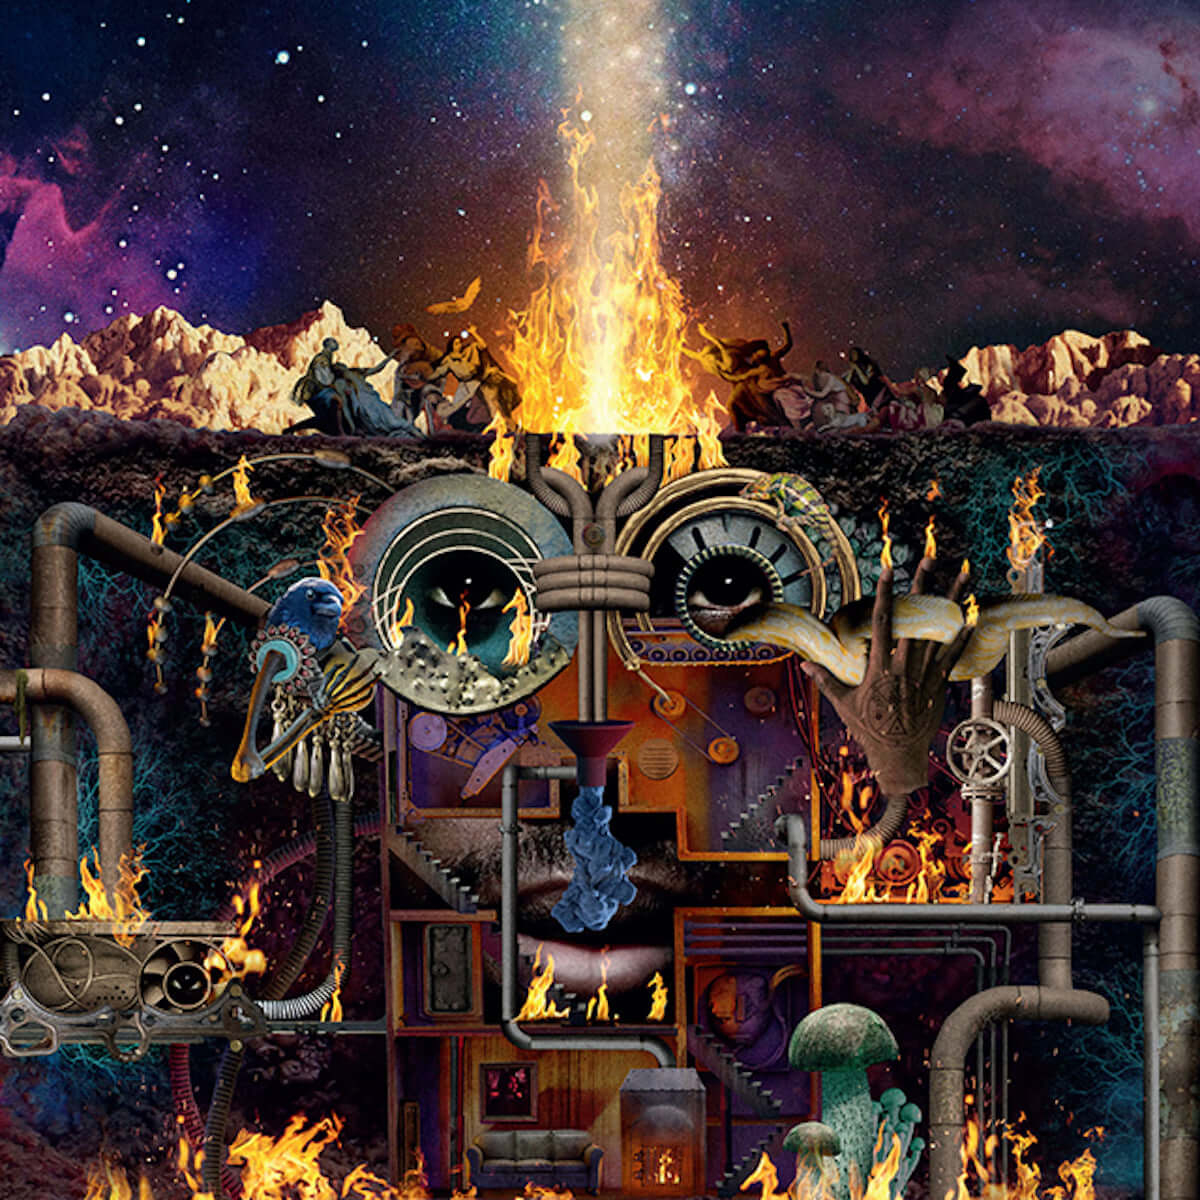 Flying Lotus、超大作『Flamagra』からDenzel Curryが客演として参加する「Black Balloons Reprise」MVが公開 music190417-flyinglotus-1-1200x1200